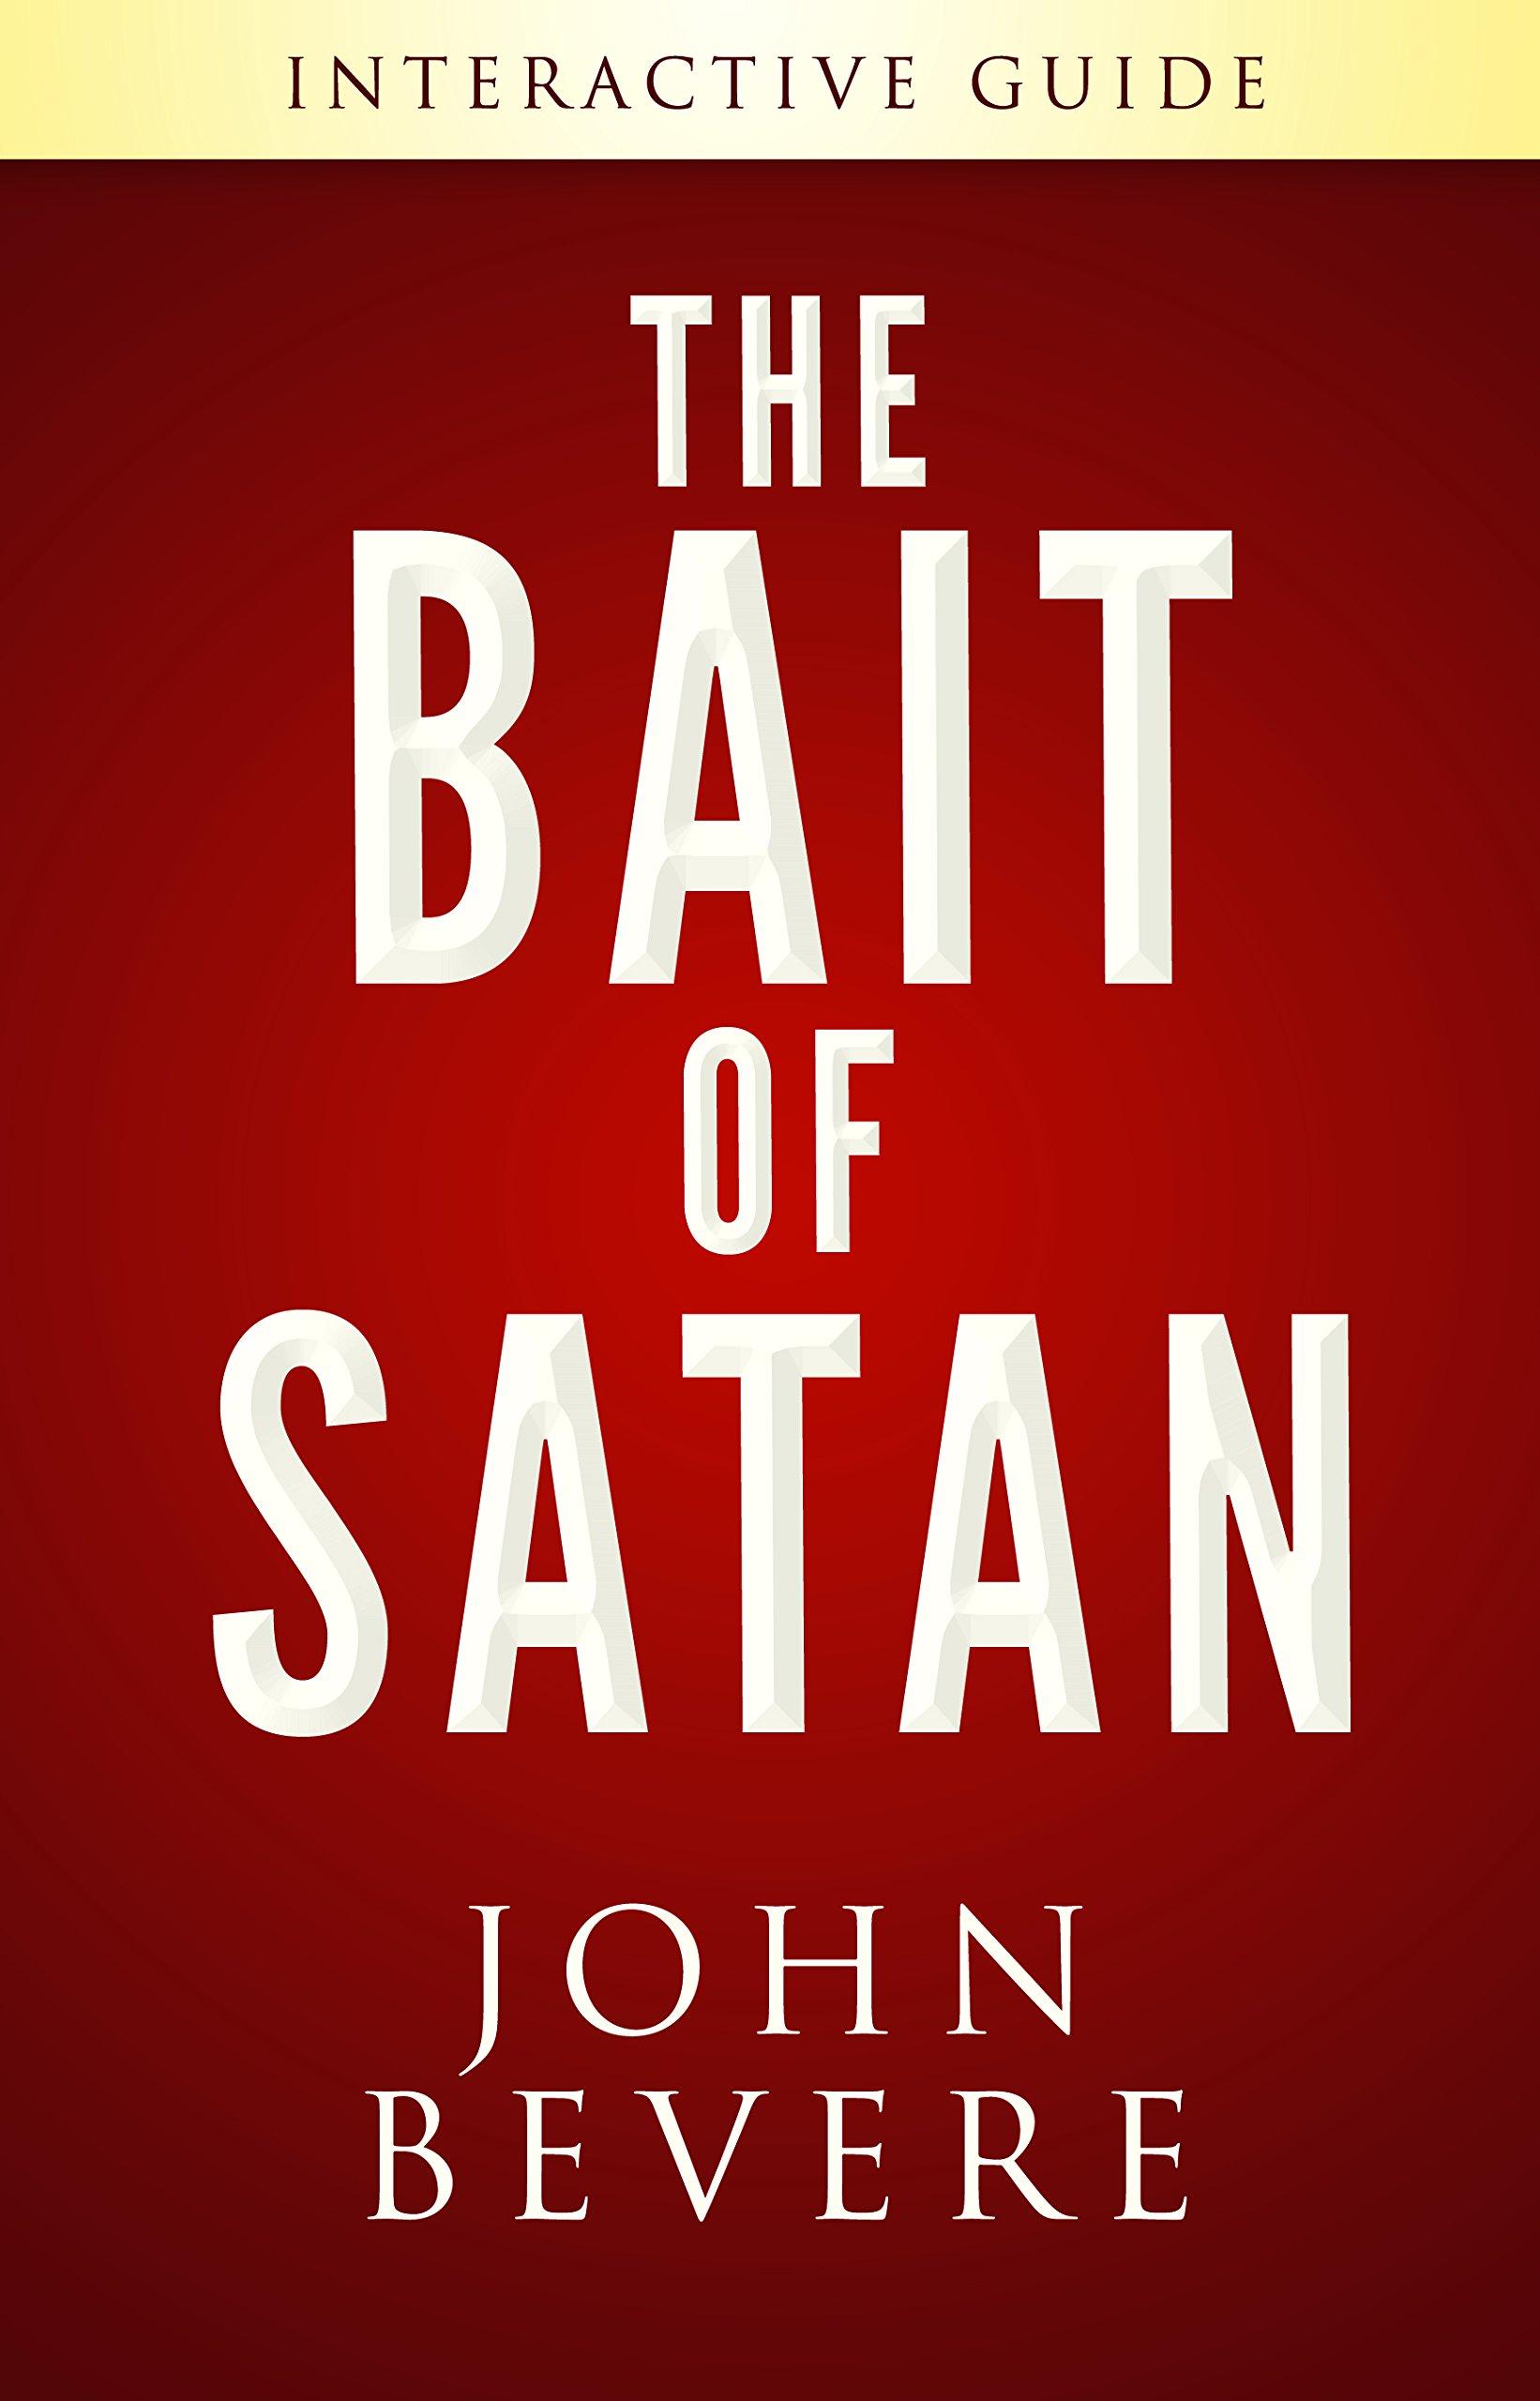 FREE THE BAIT OF SATAN EPUB DOWNLOAD